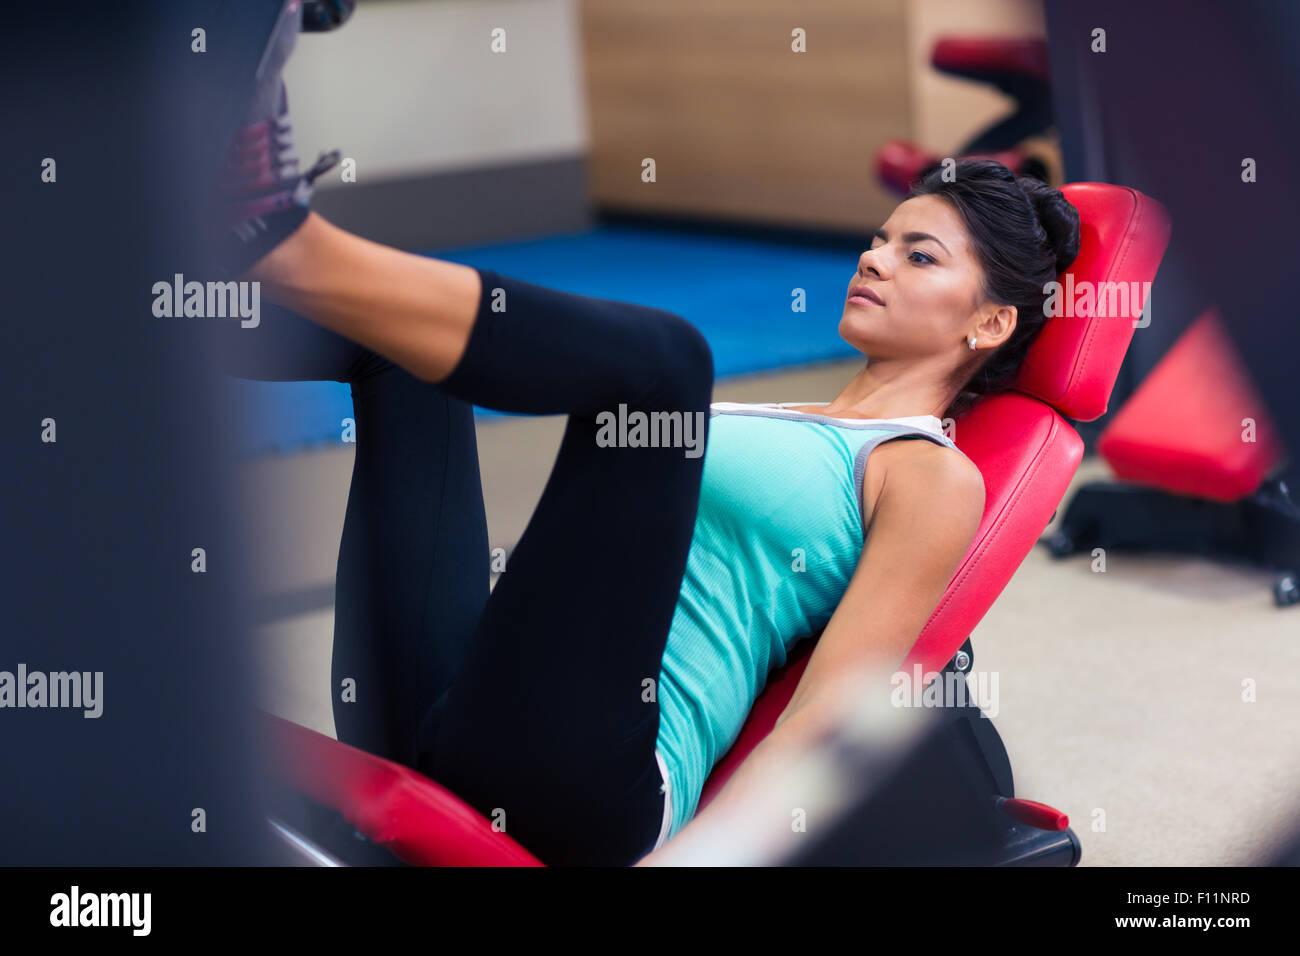 Porträt eines Sport-Frau-Trainings auf Übungen im Fitness-Studio Stockbild